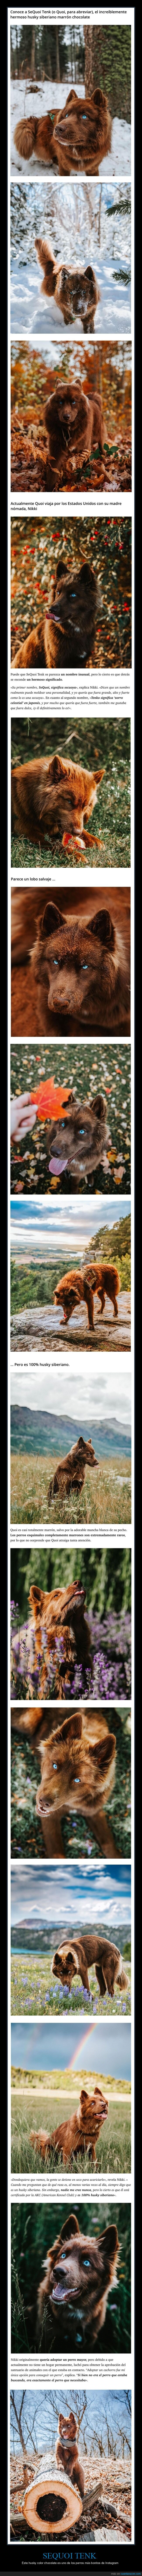 husky,perro,sequoi tenk